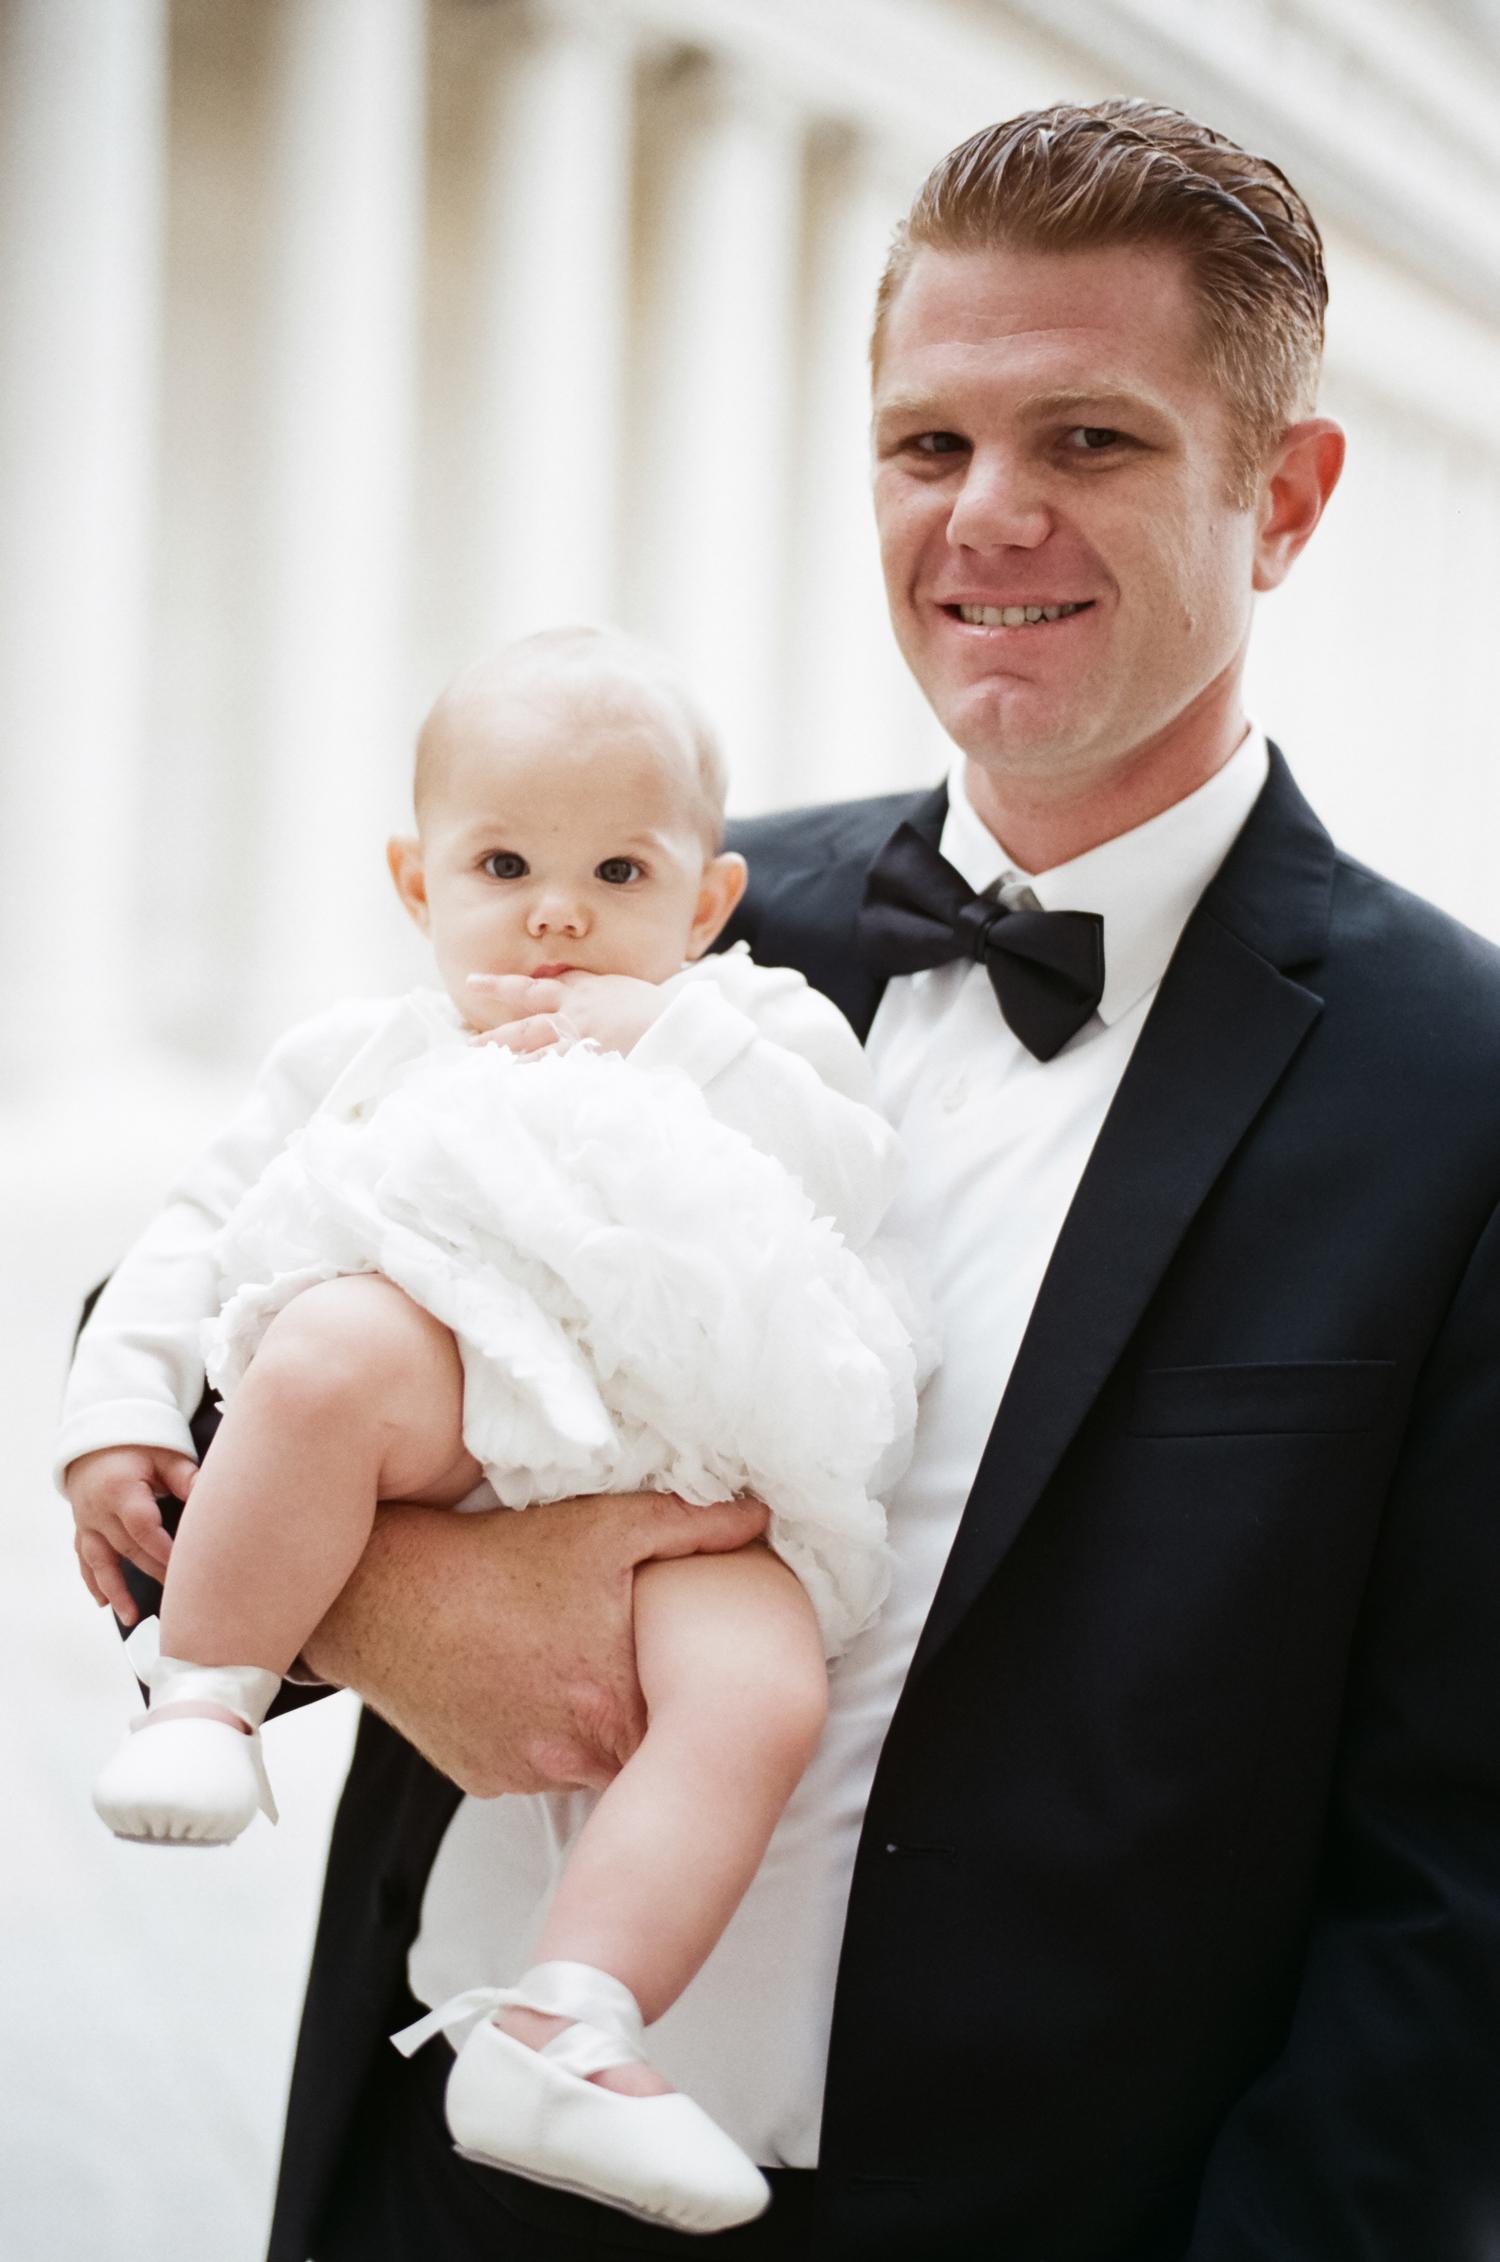 groom holding baby